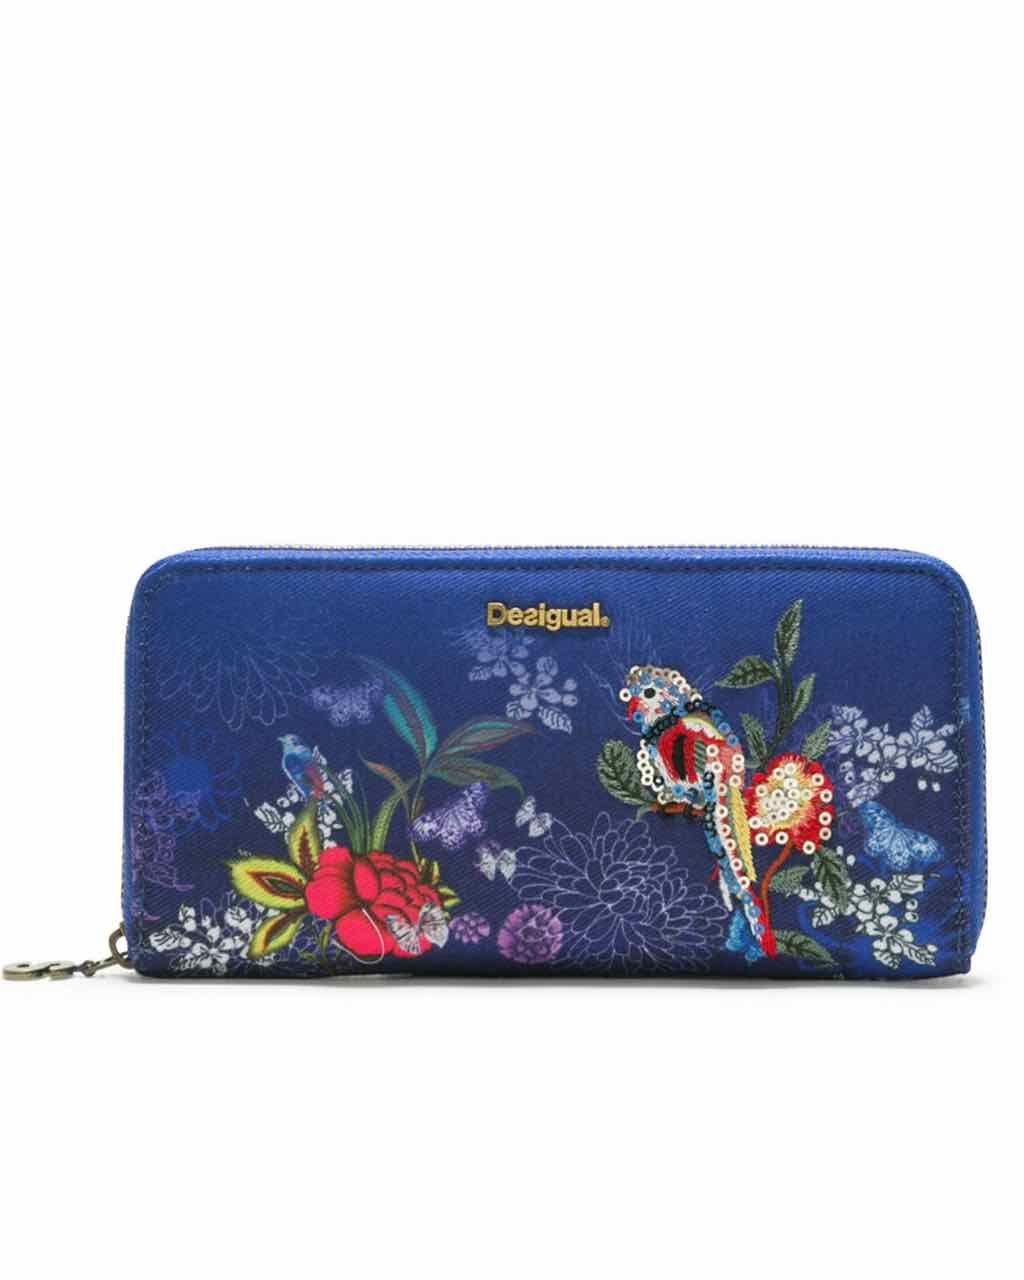 DESIGUAL Wallet BIRDPALM FIONA 18SAYF17 Blue  207a717ee2